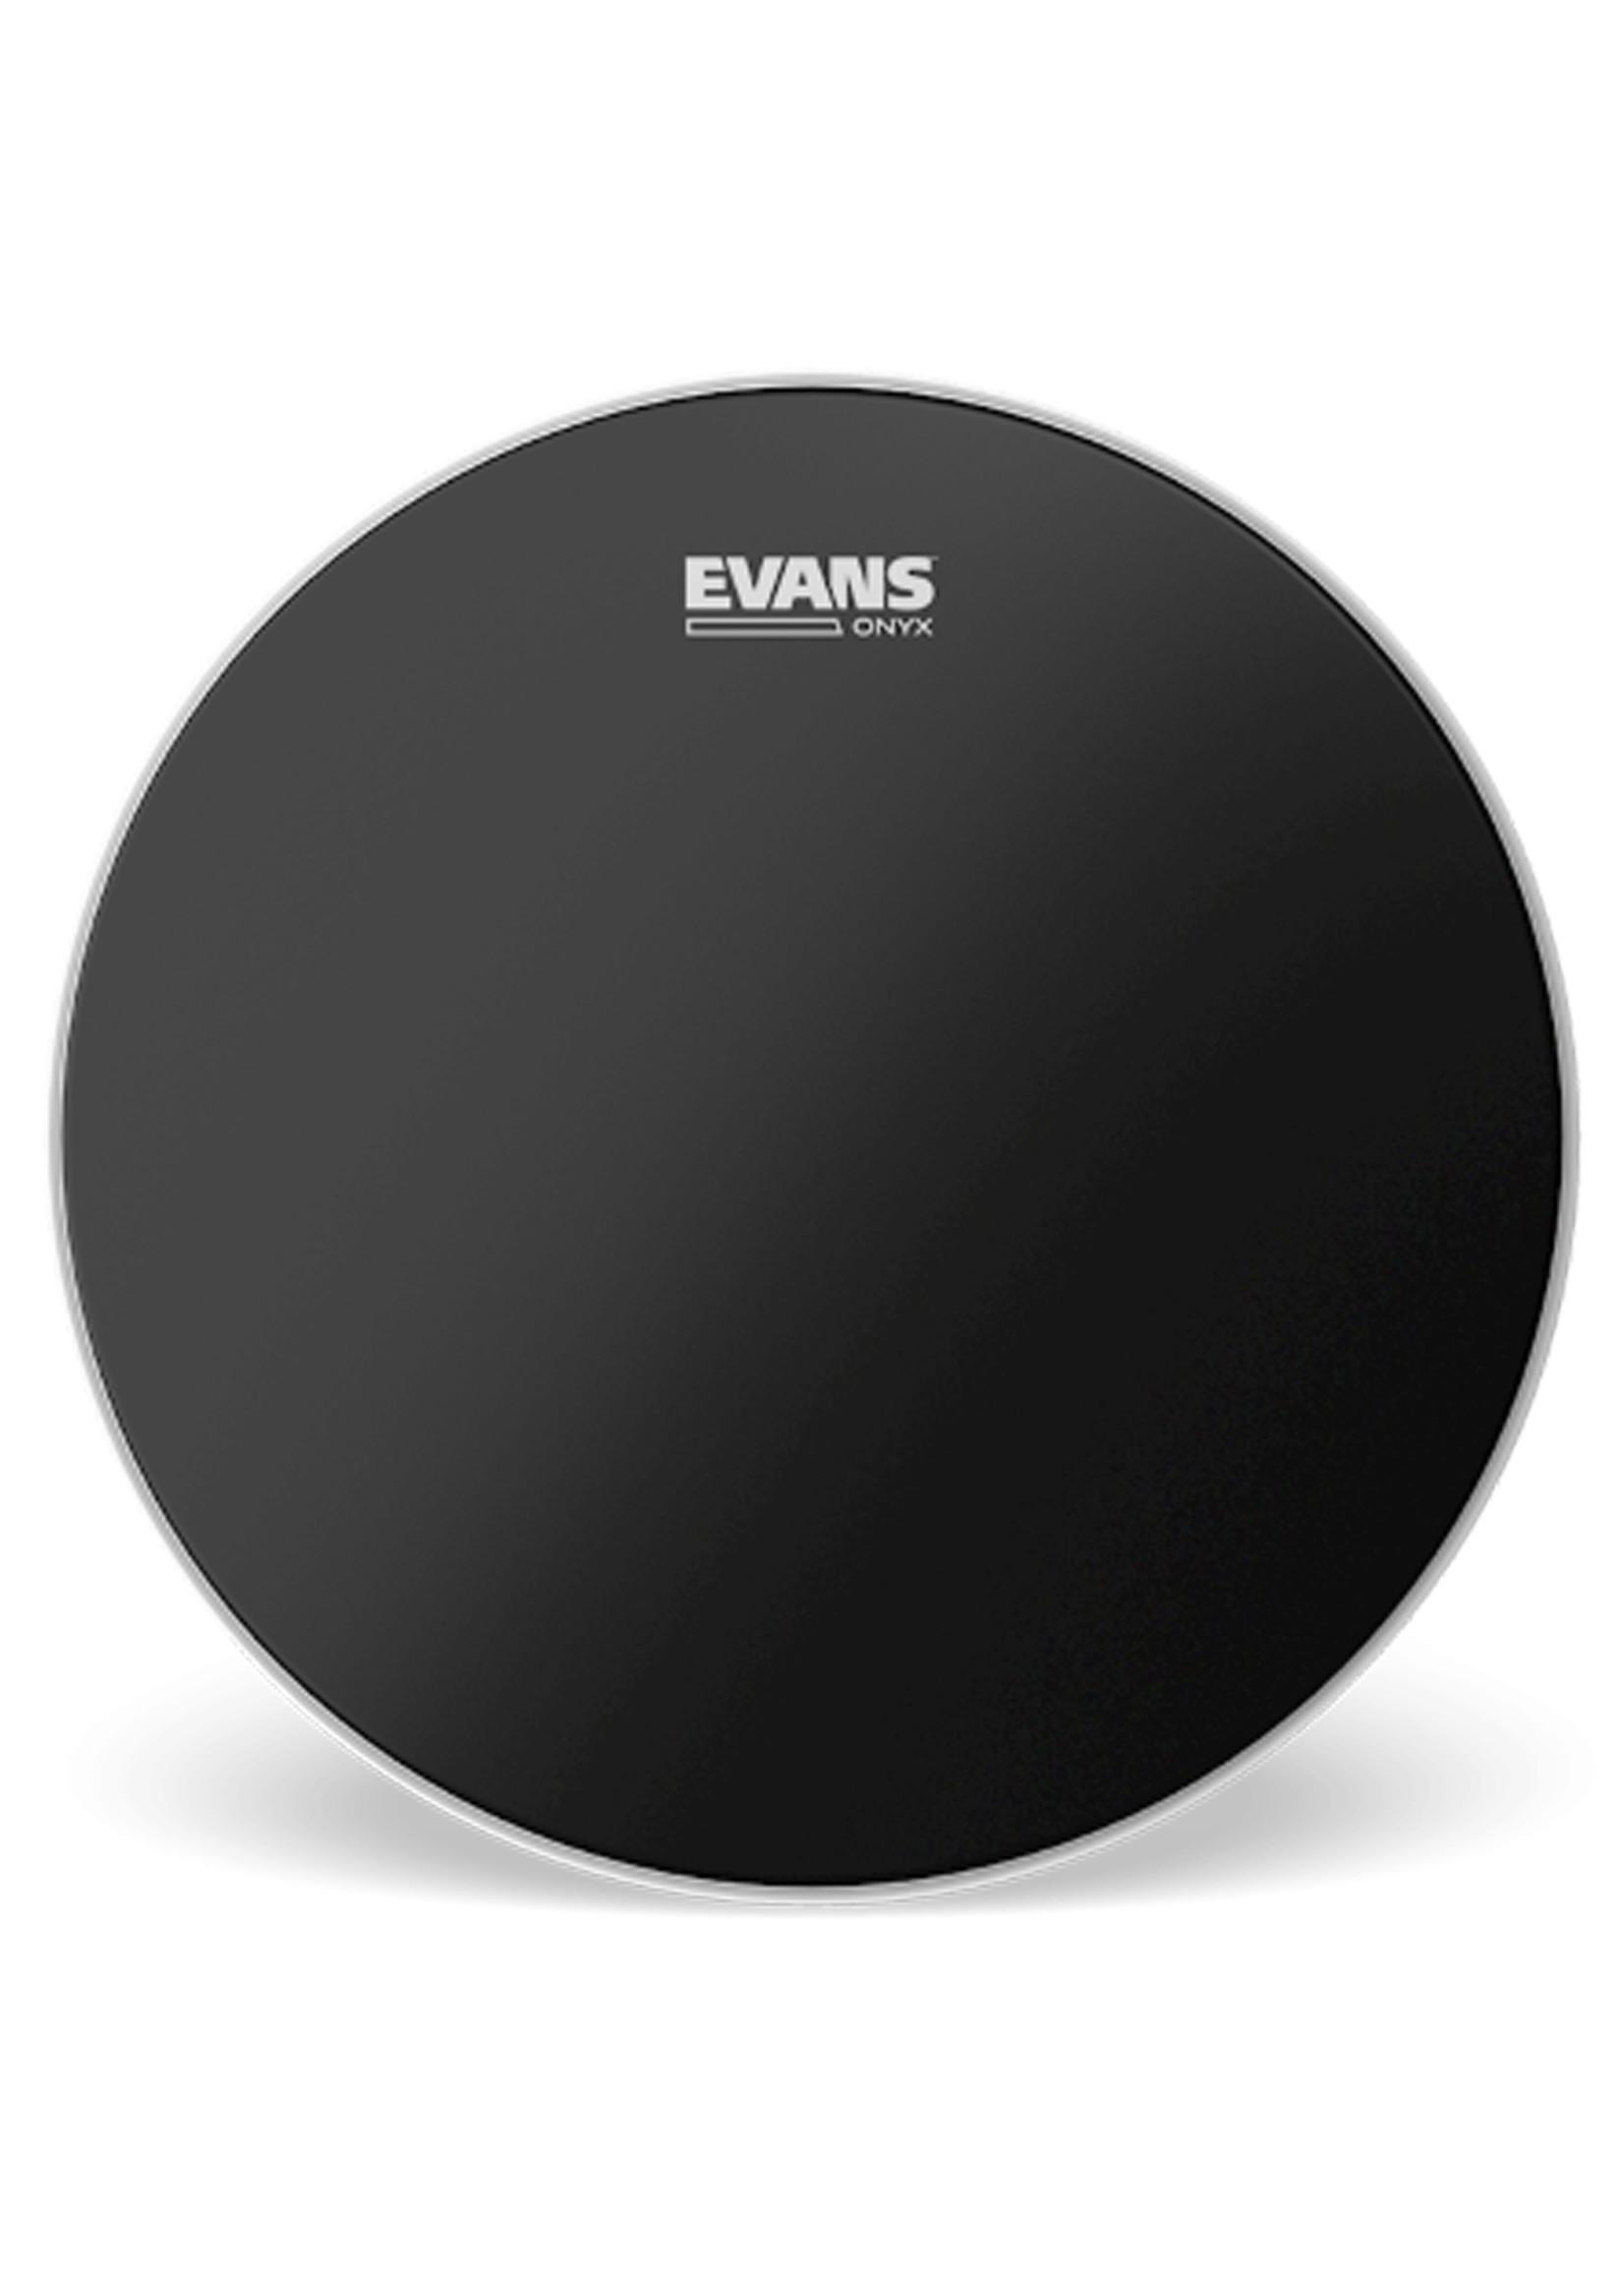 "Evans Evans 10"" Onyx"